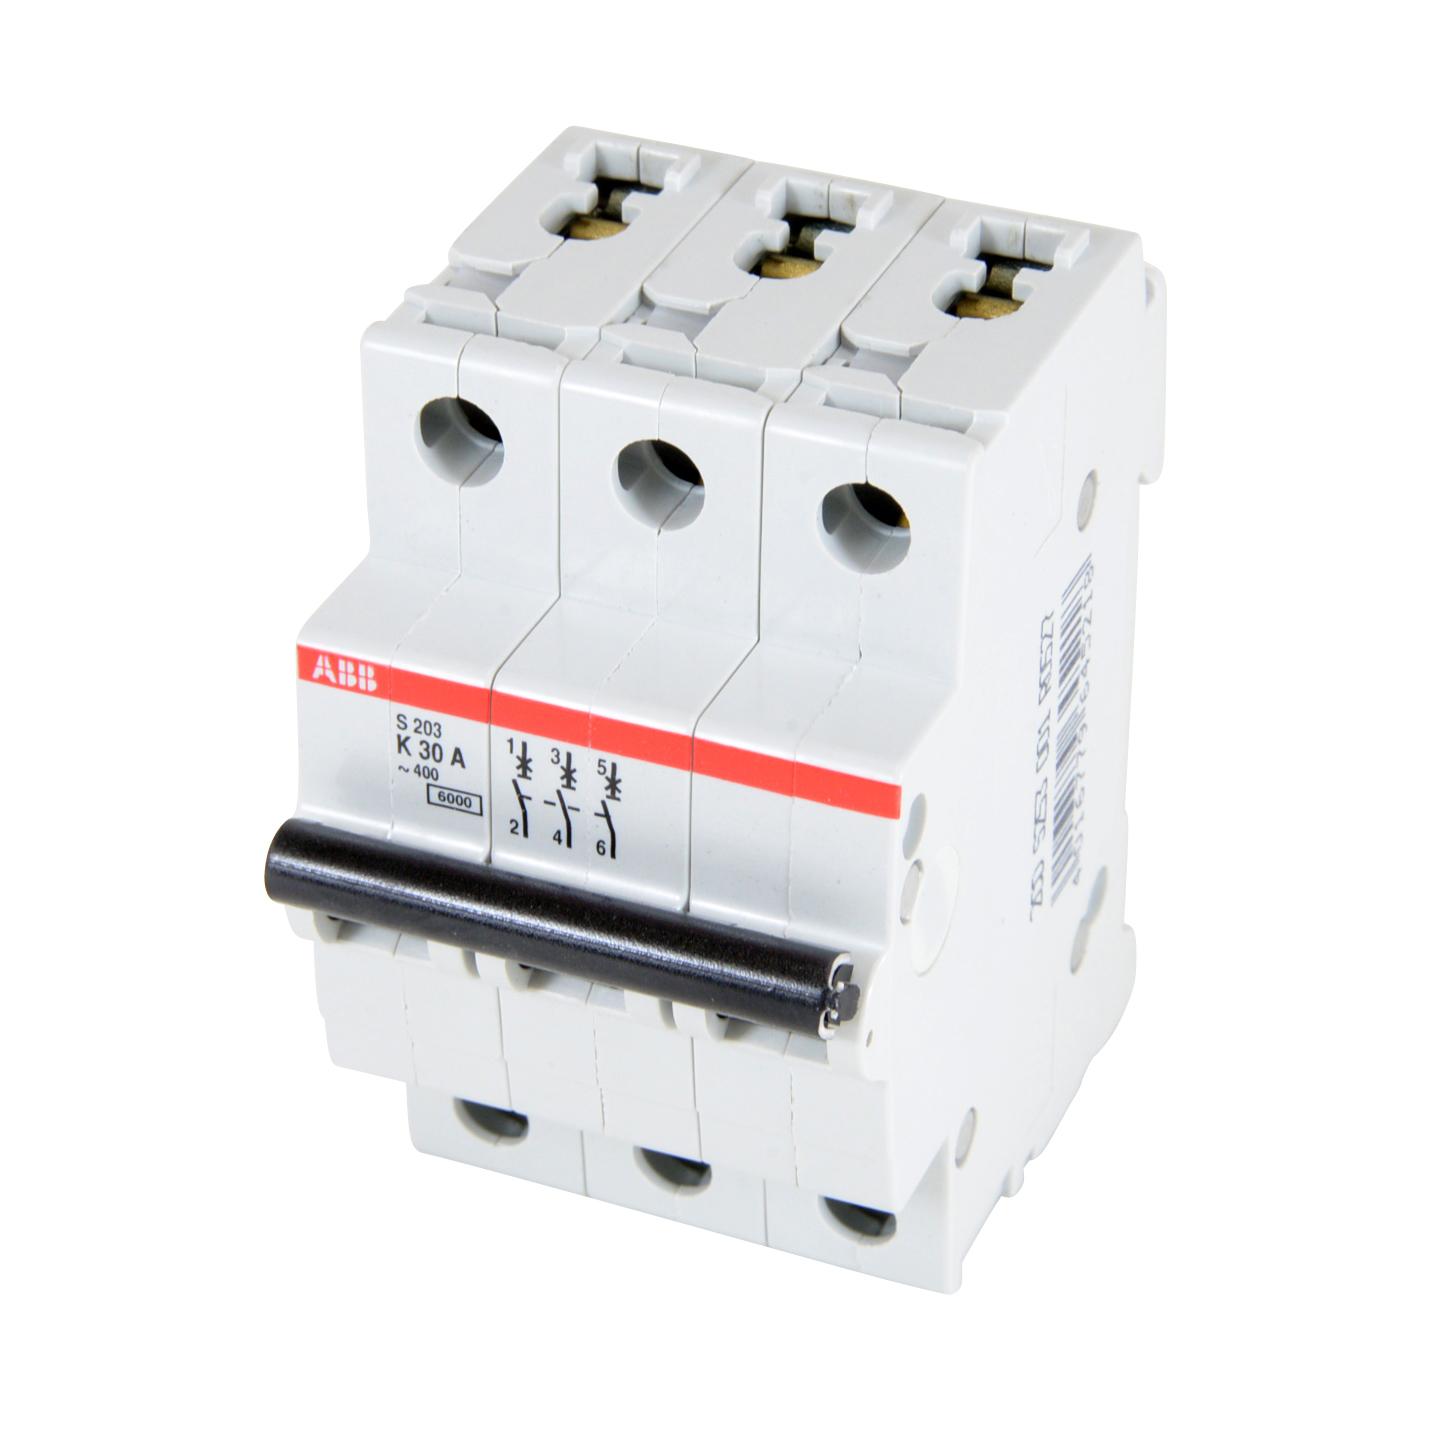 ABB,S203-K30,ABB S200 Low Voltage Miniature Circuit Breaker, 277/Y480 VAC, 30 A, 6 kA Interrupt, 3 Poles